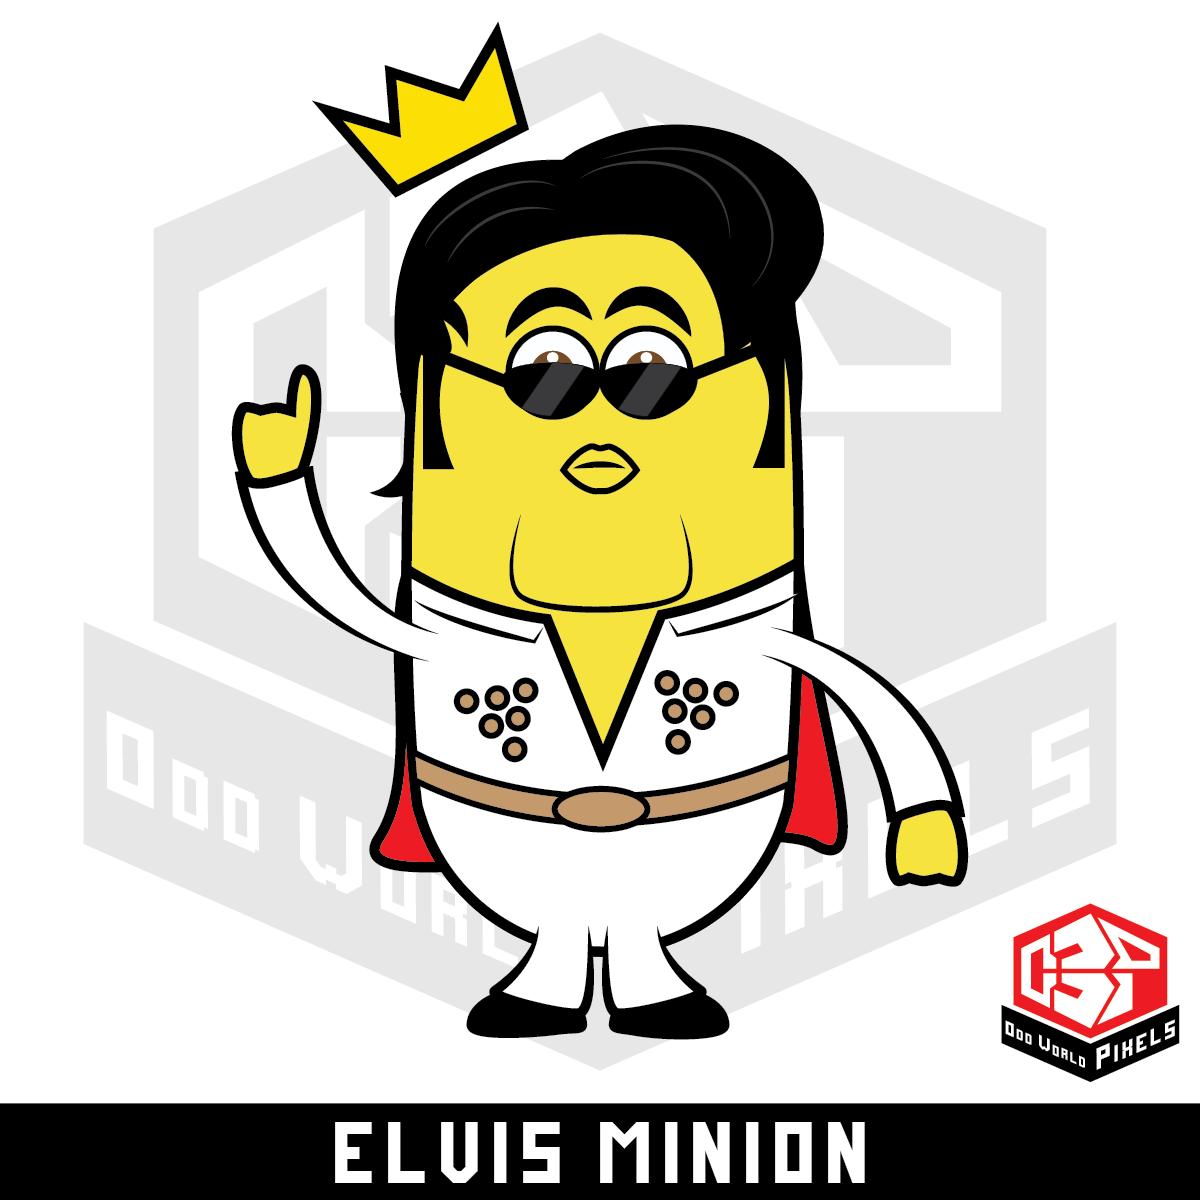 Odd World Pixels Fairly Odd Elvis Minion